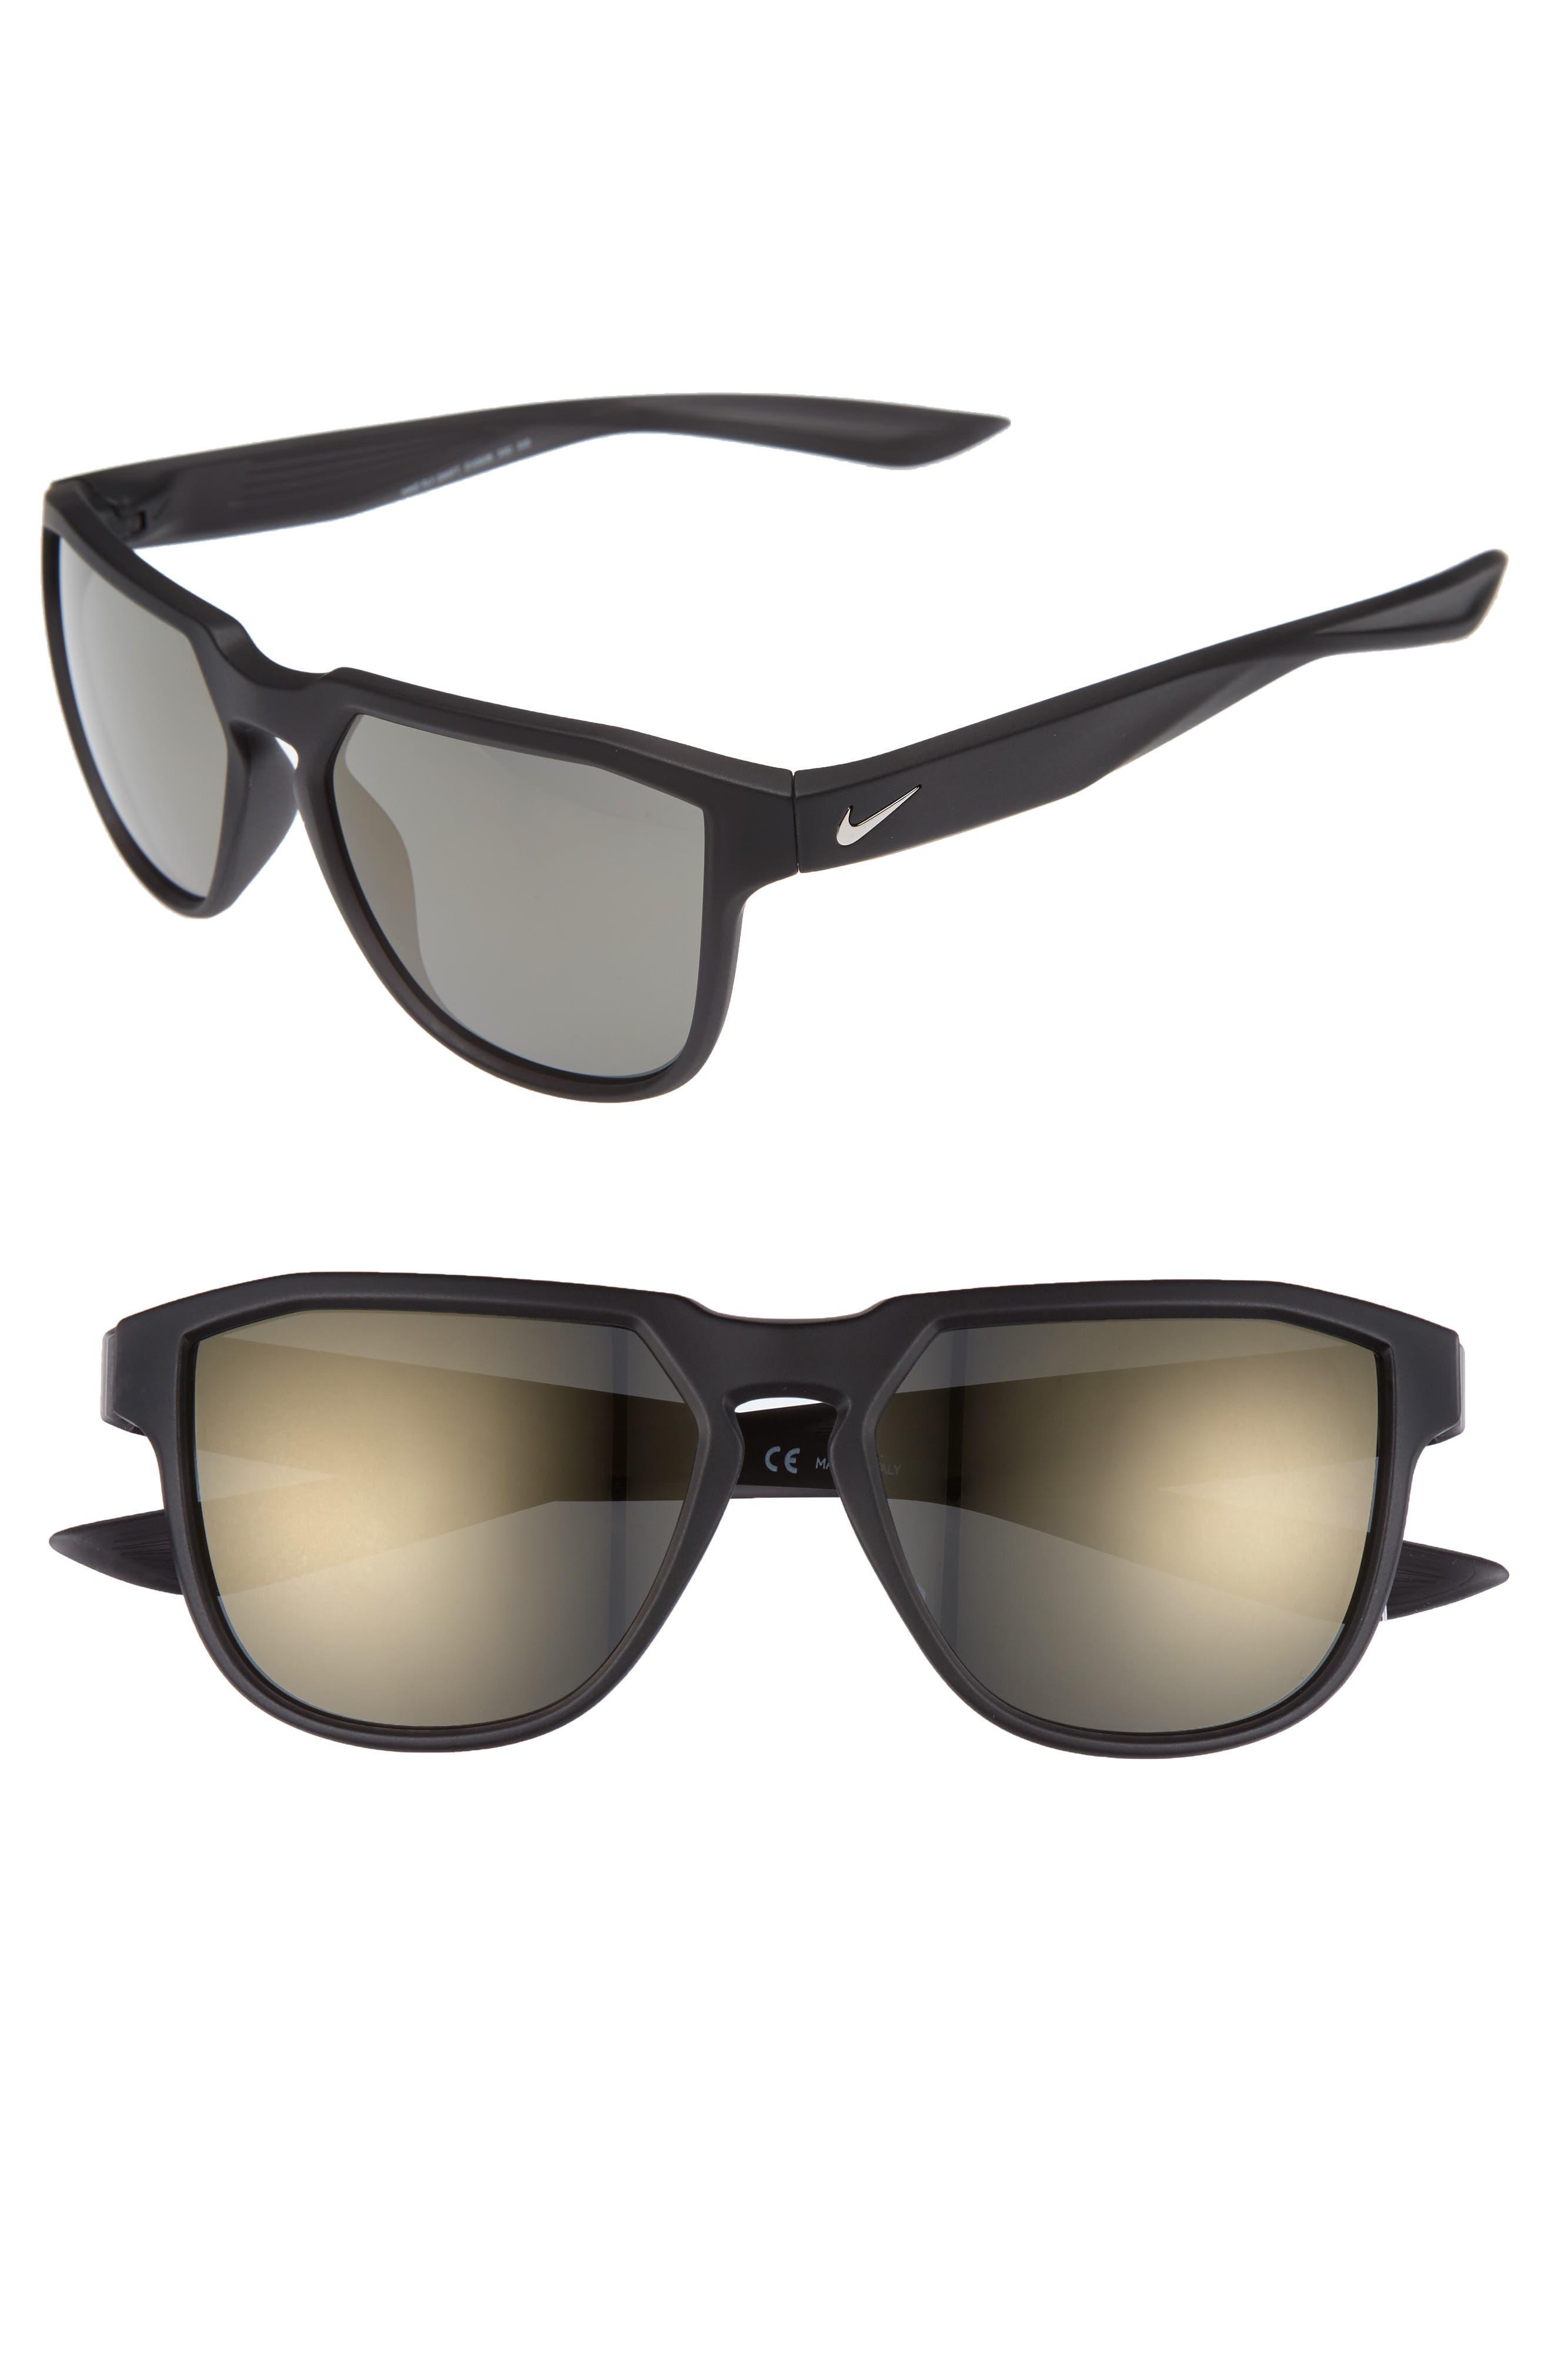 Nike Fly Swift 57mm Sunglasses